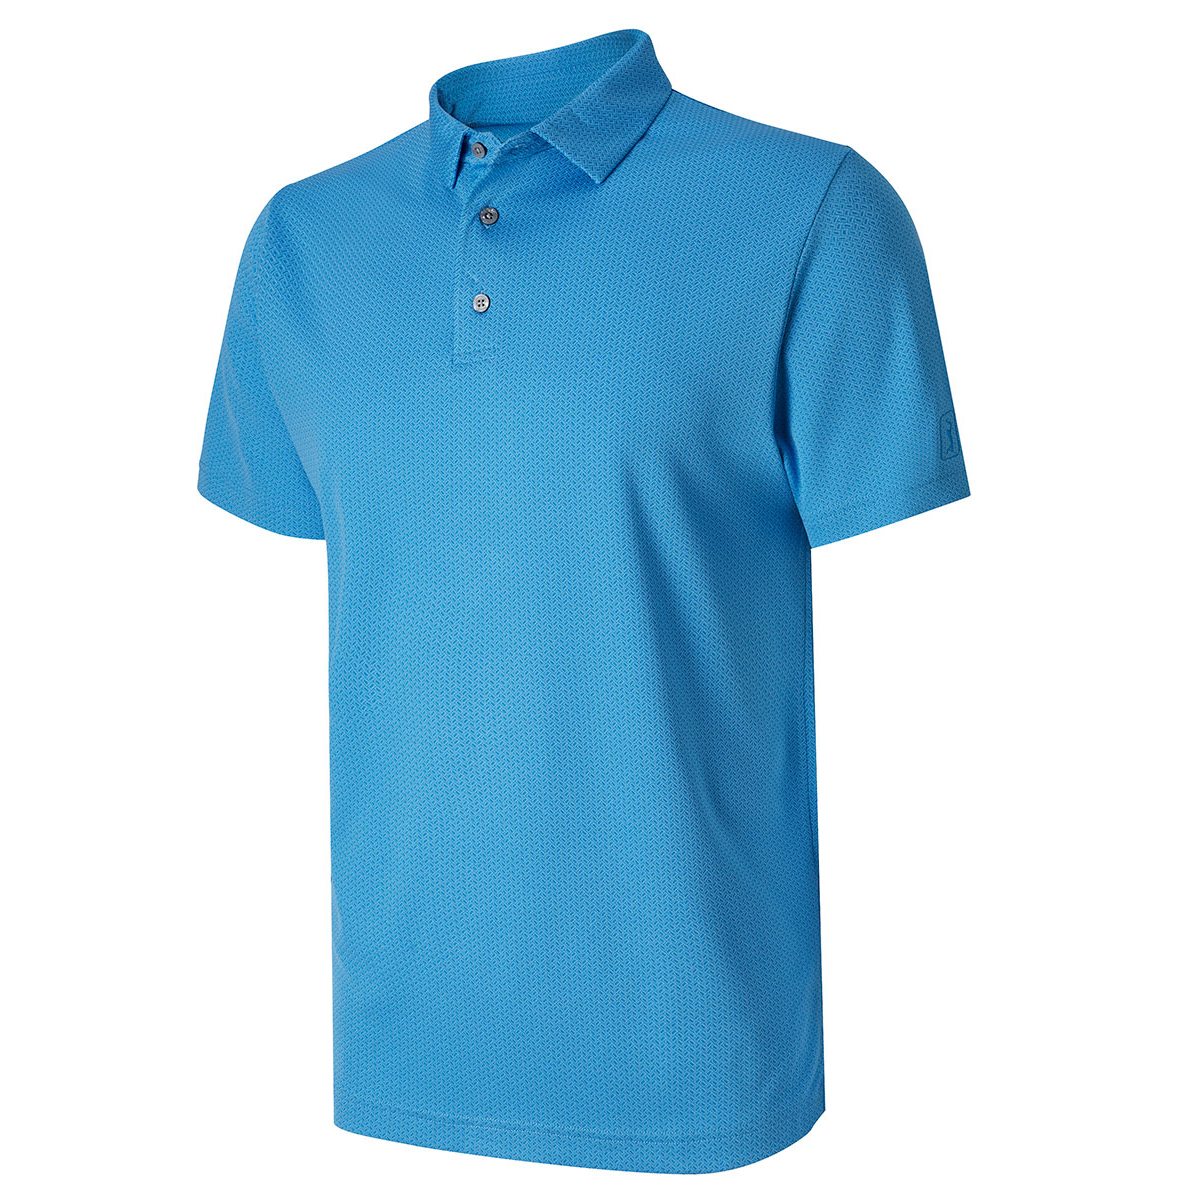 pga tour jacquard polo shirt